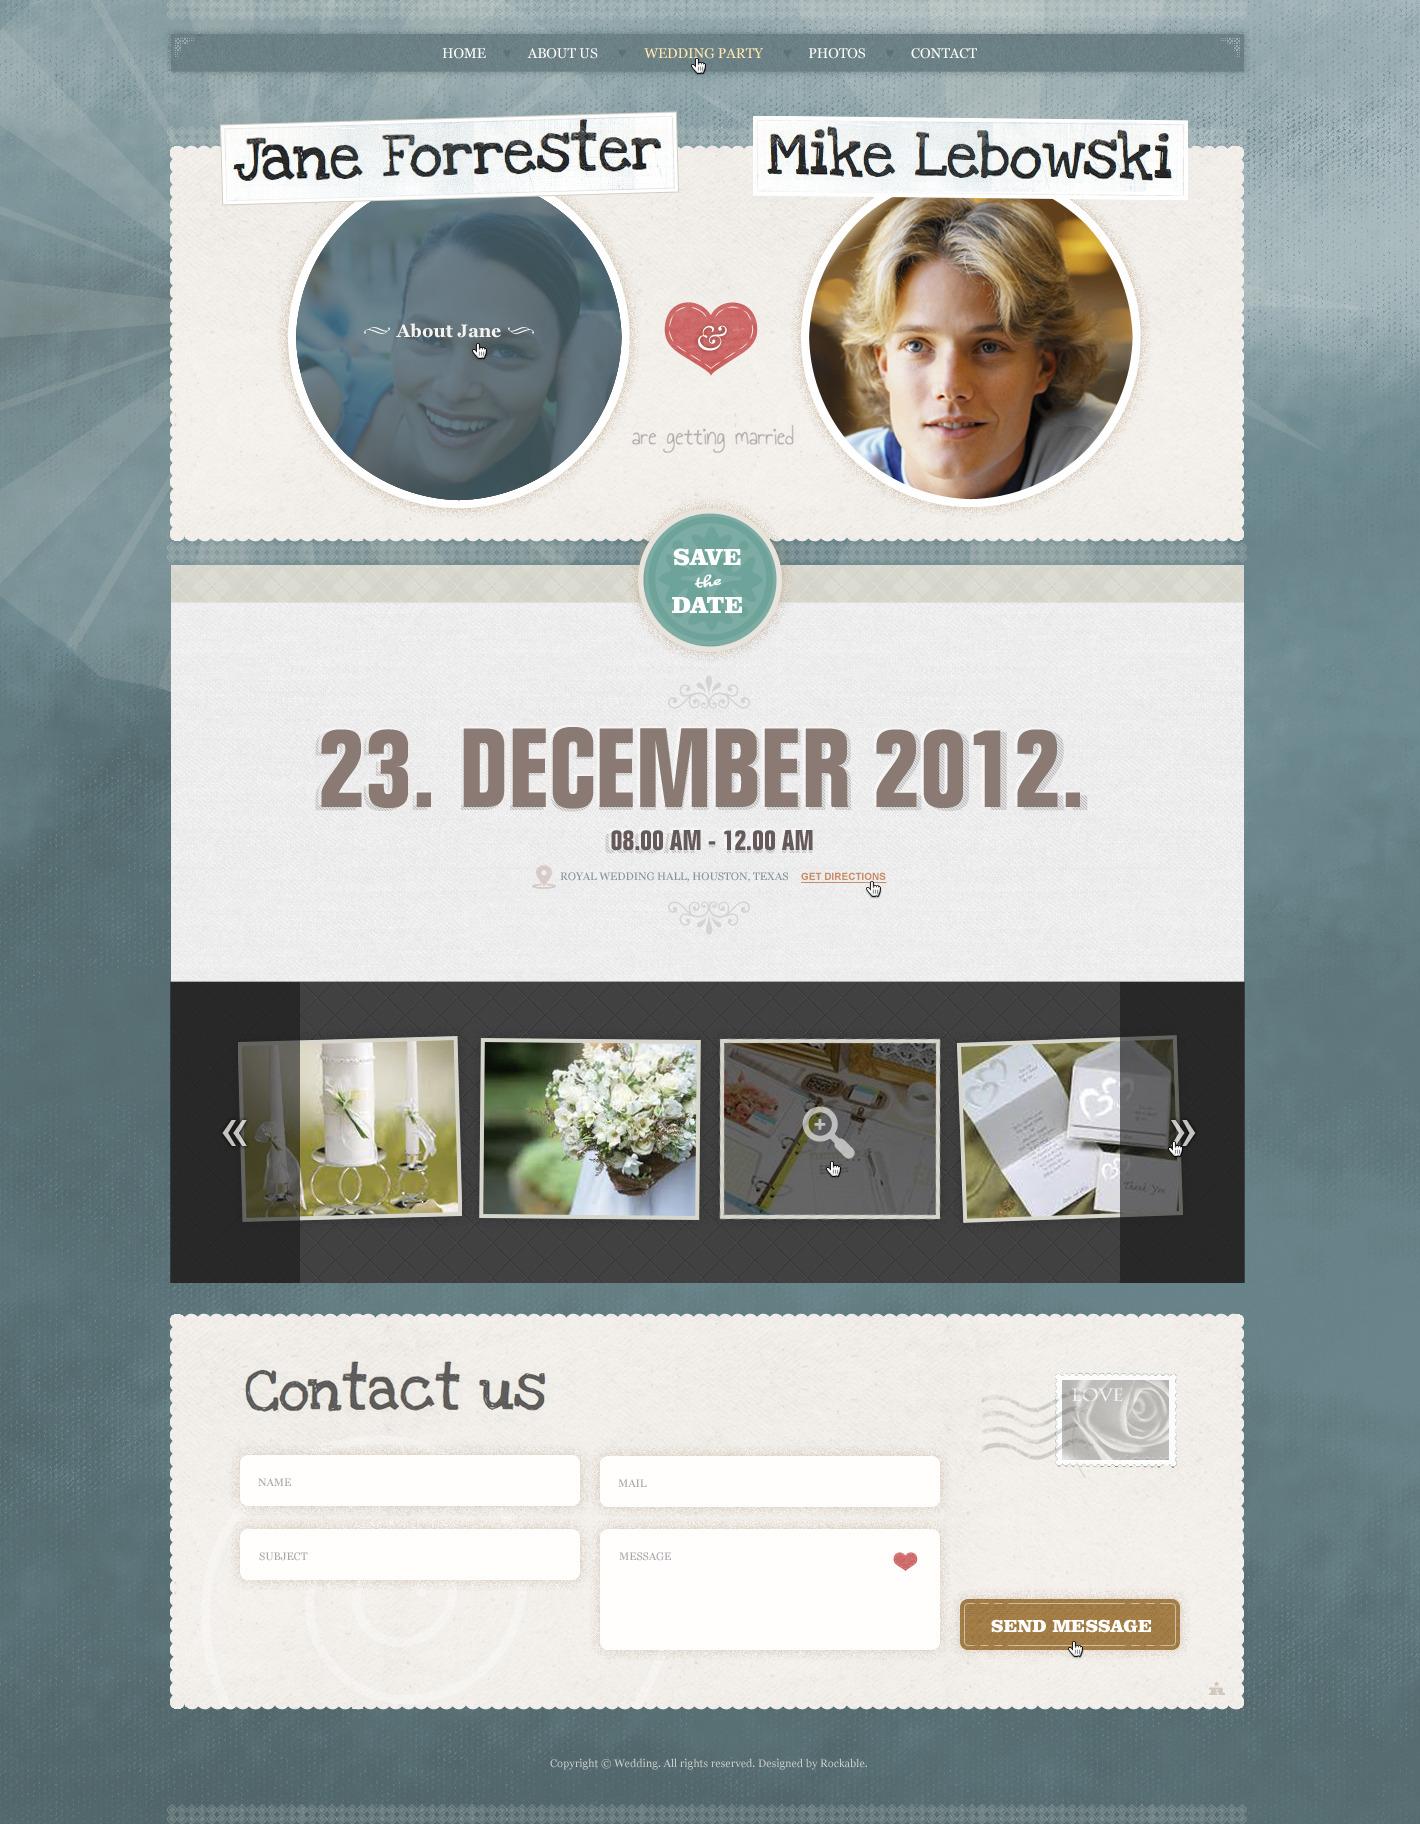 Wedding invite by rockable themeforest wedding invite stopboris Image collections